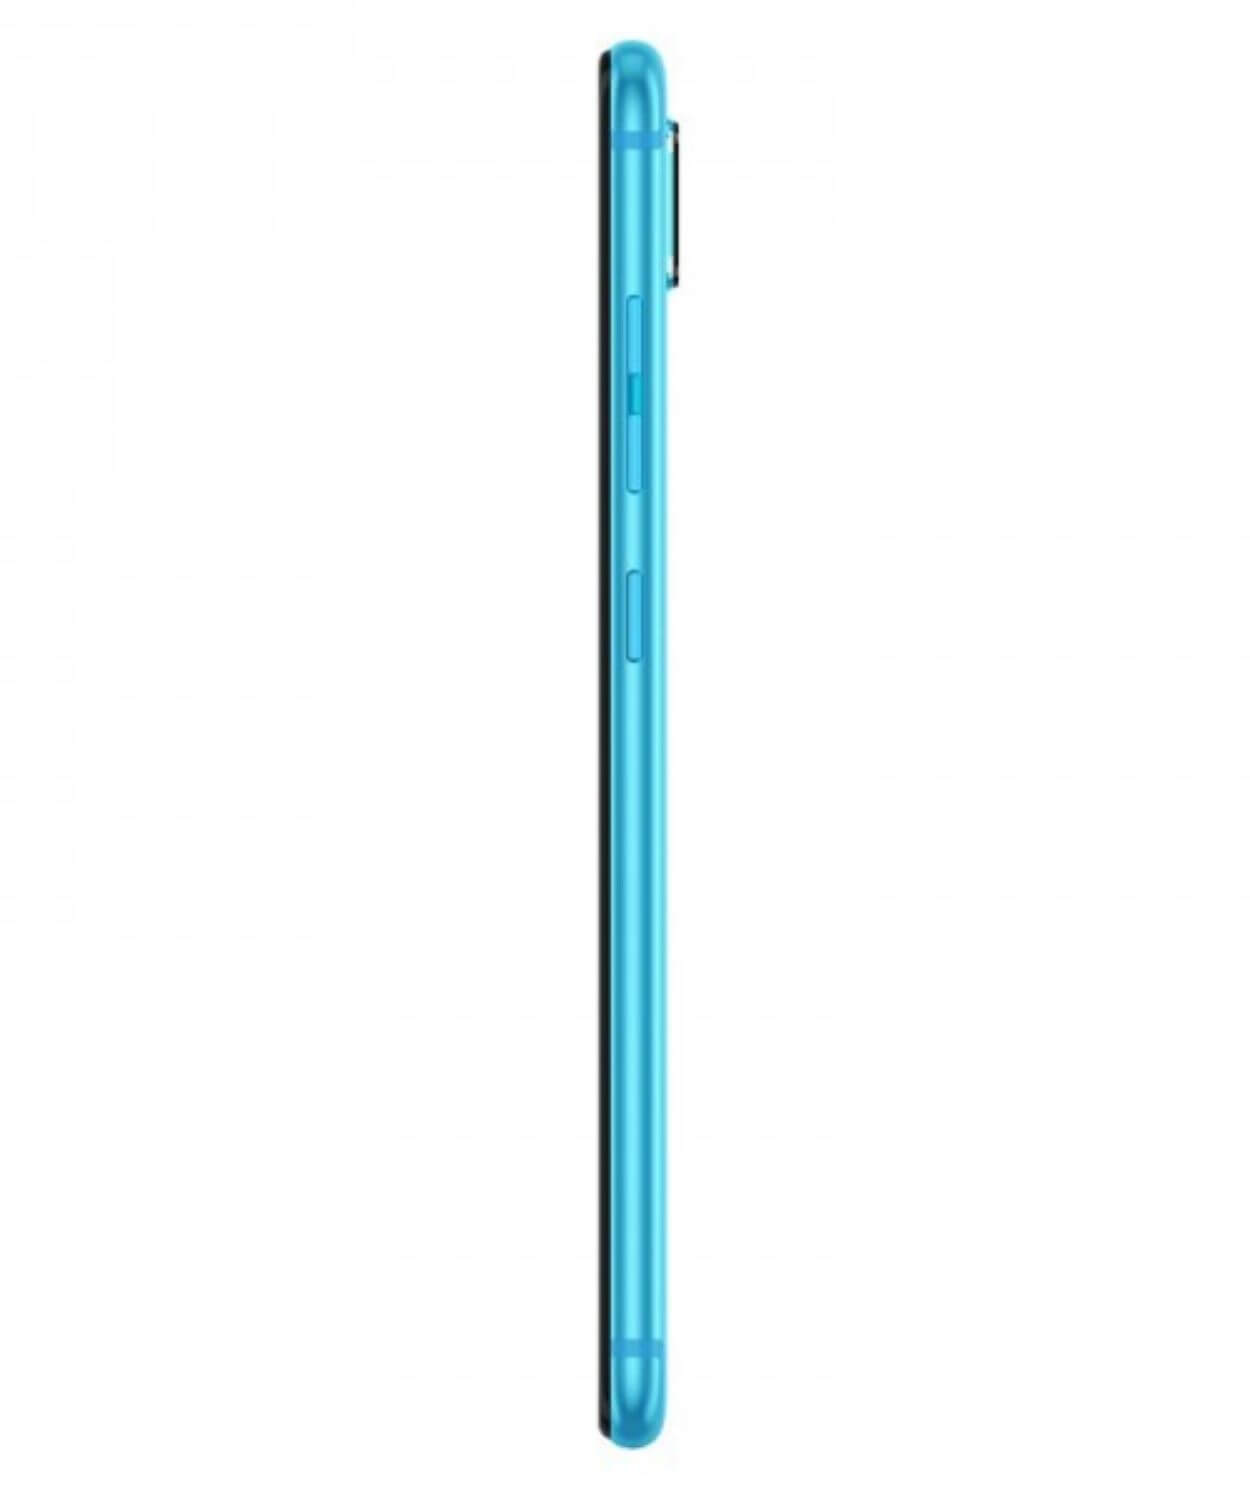 Lenovo S5 Pro GT